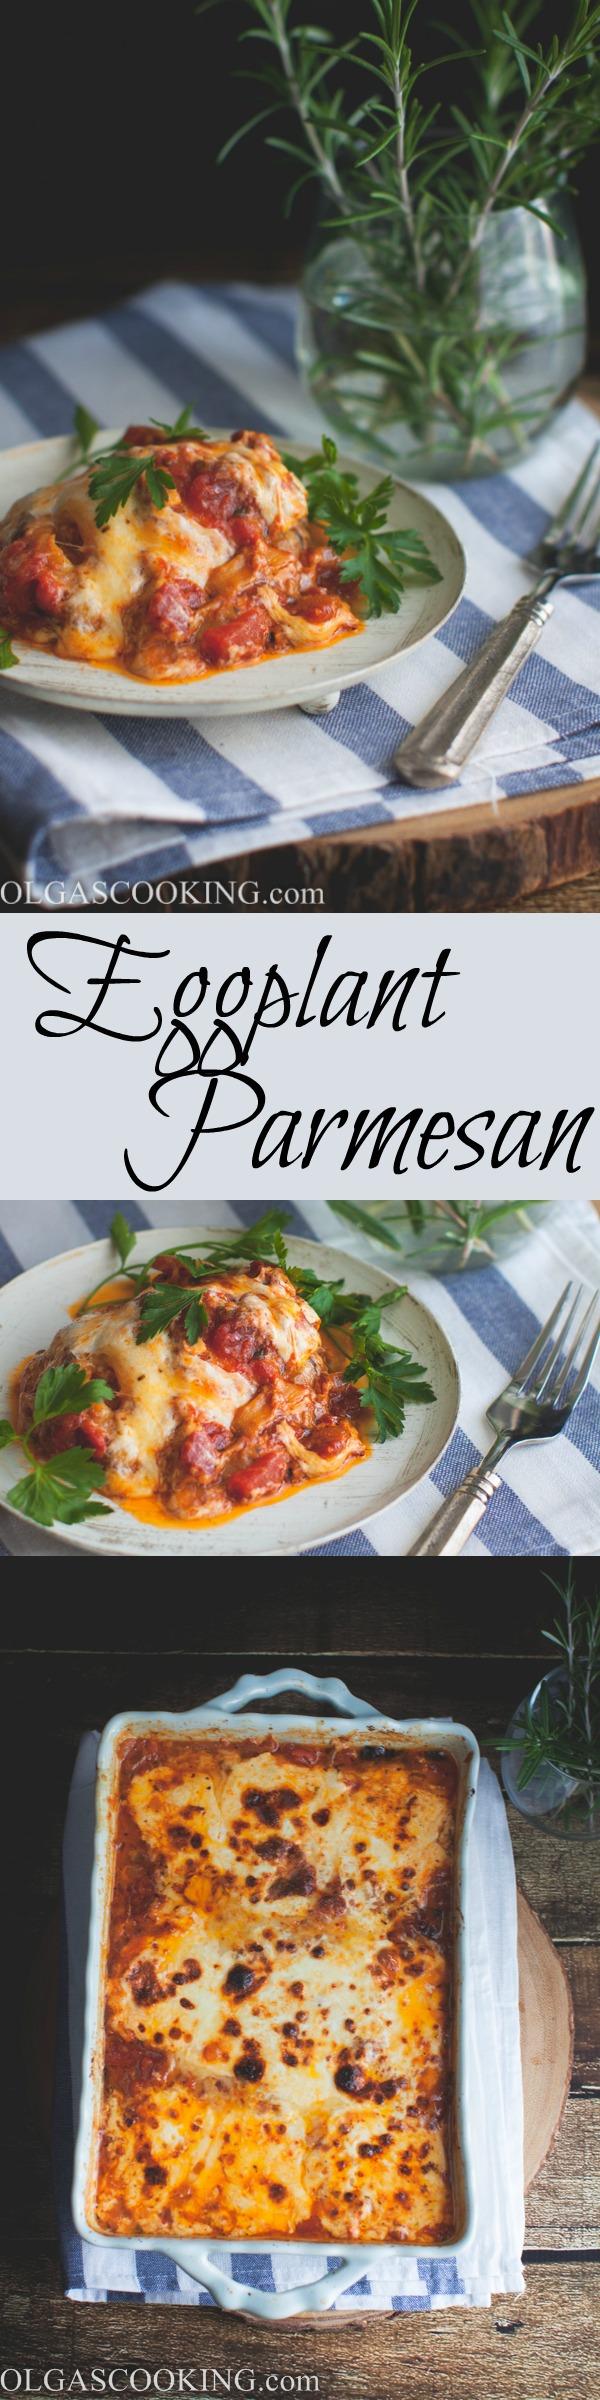 Best ever Eggplant Parmesan recipe!